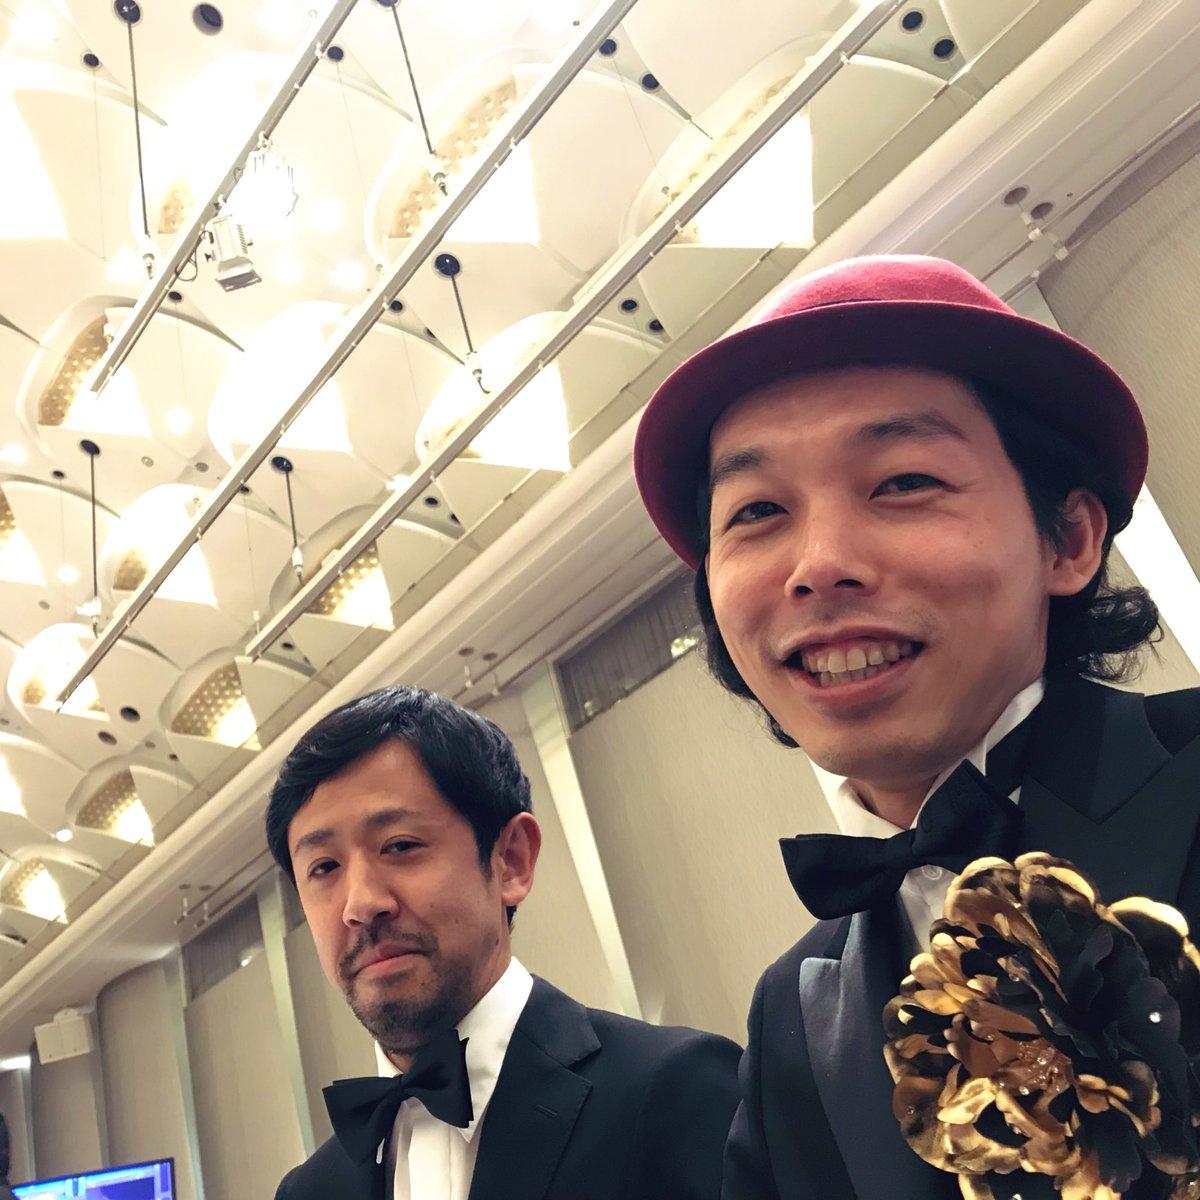 RT @shin0407: 受賞会場に到着! #日本アカデミー賞 https://t.co/myLrSBeYIS